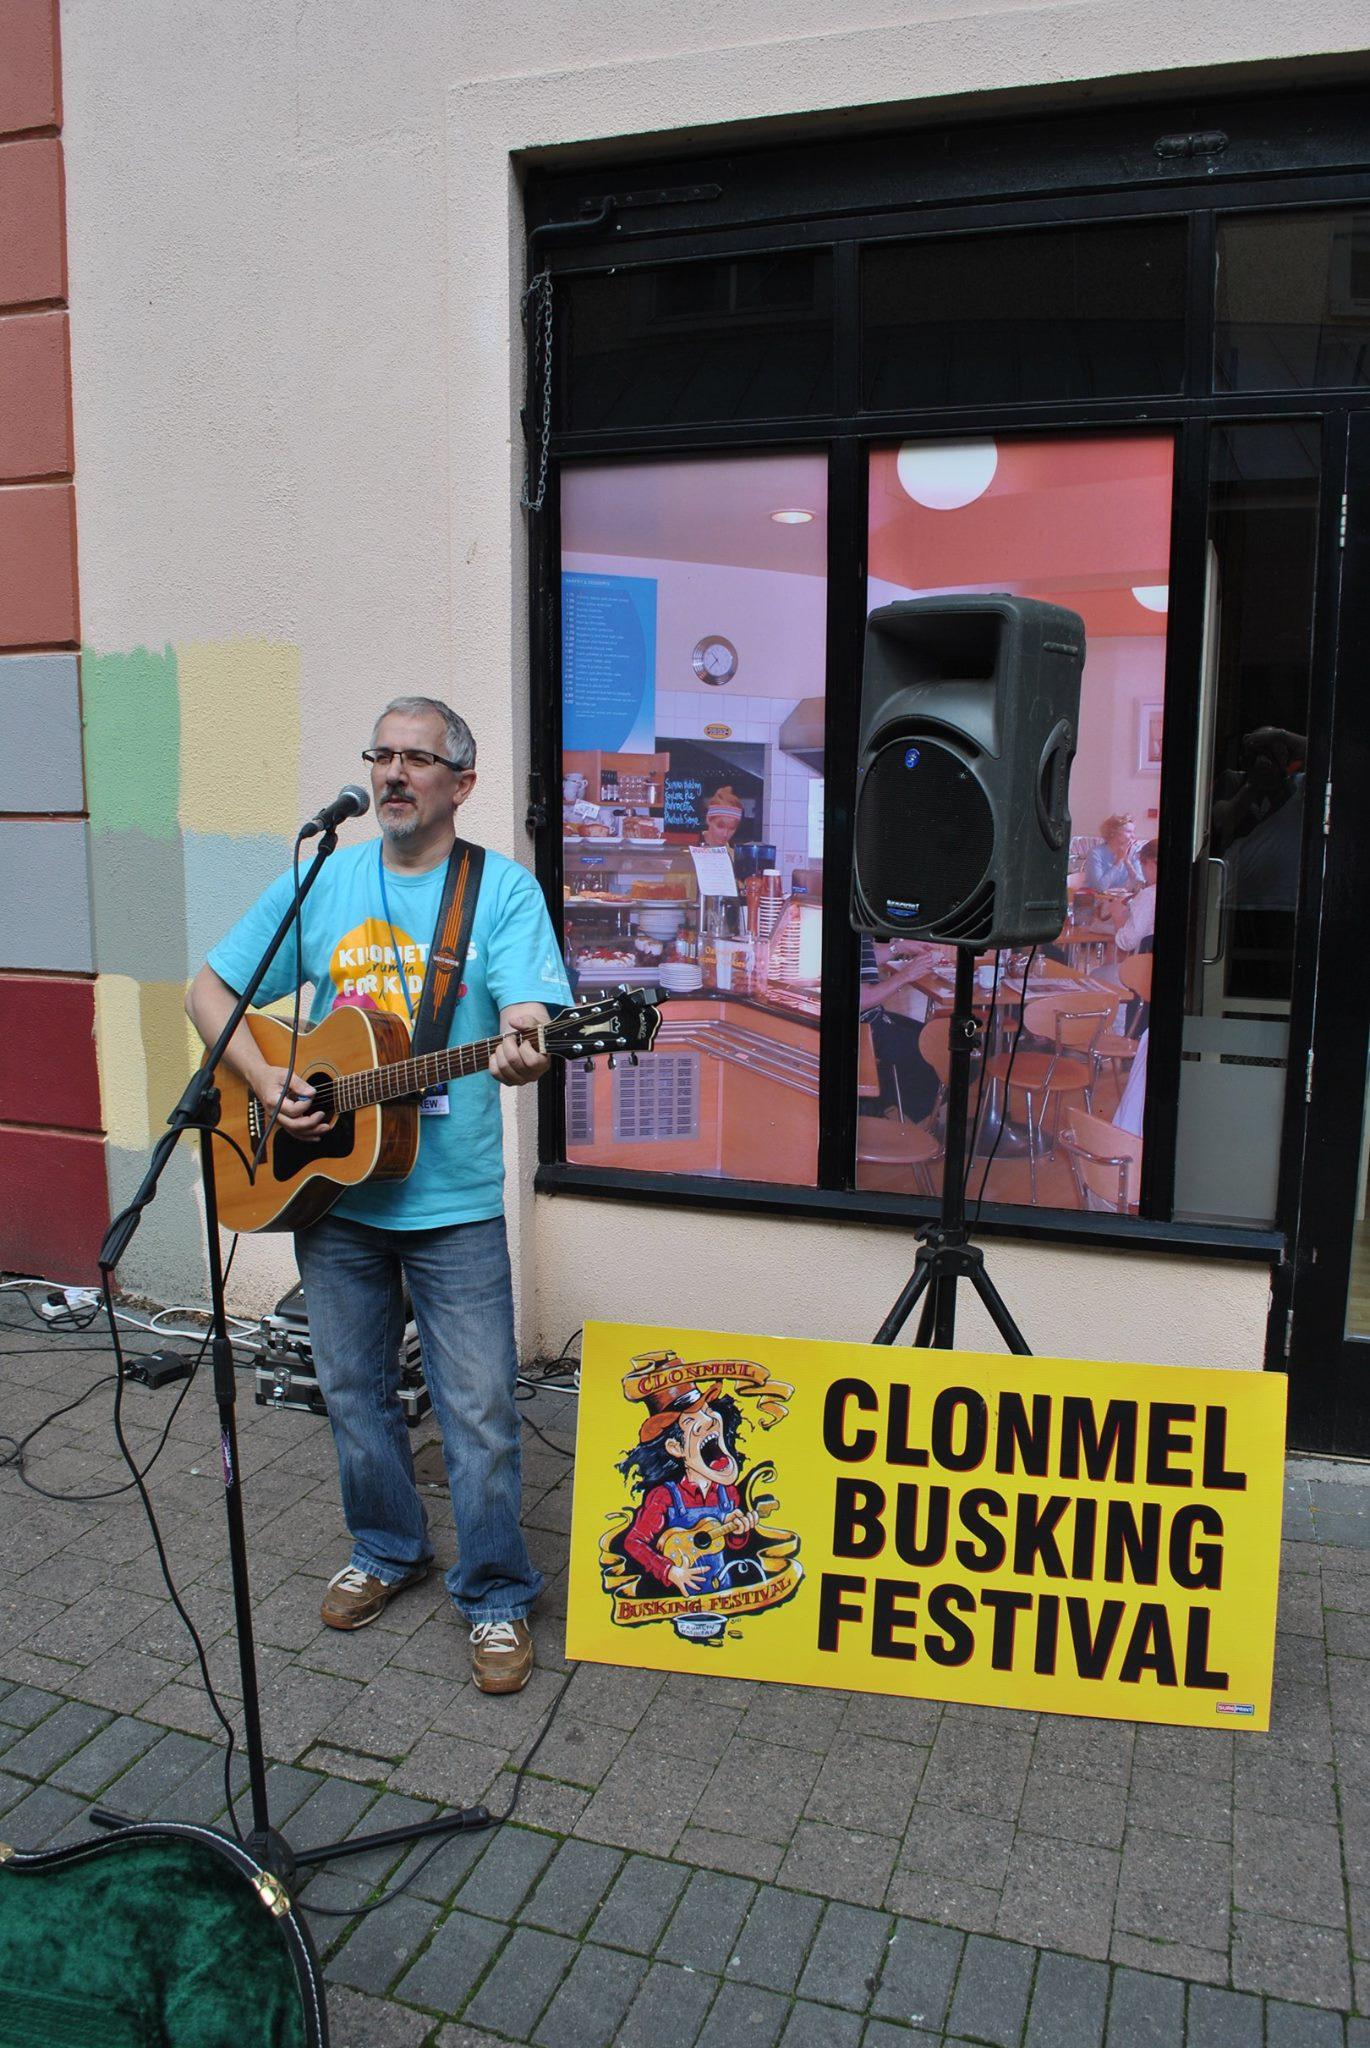 Clonmel Busking Festival | Photo 05